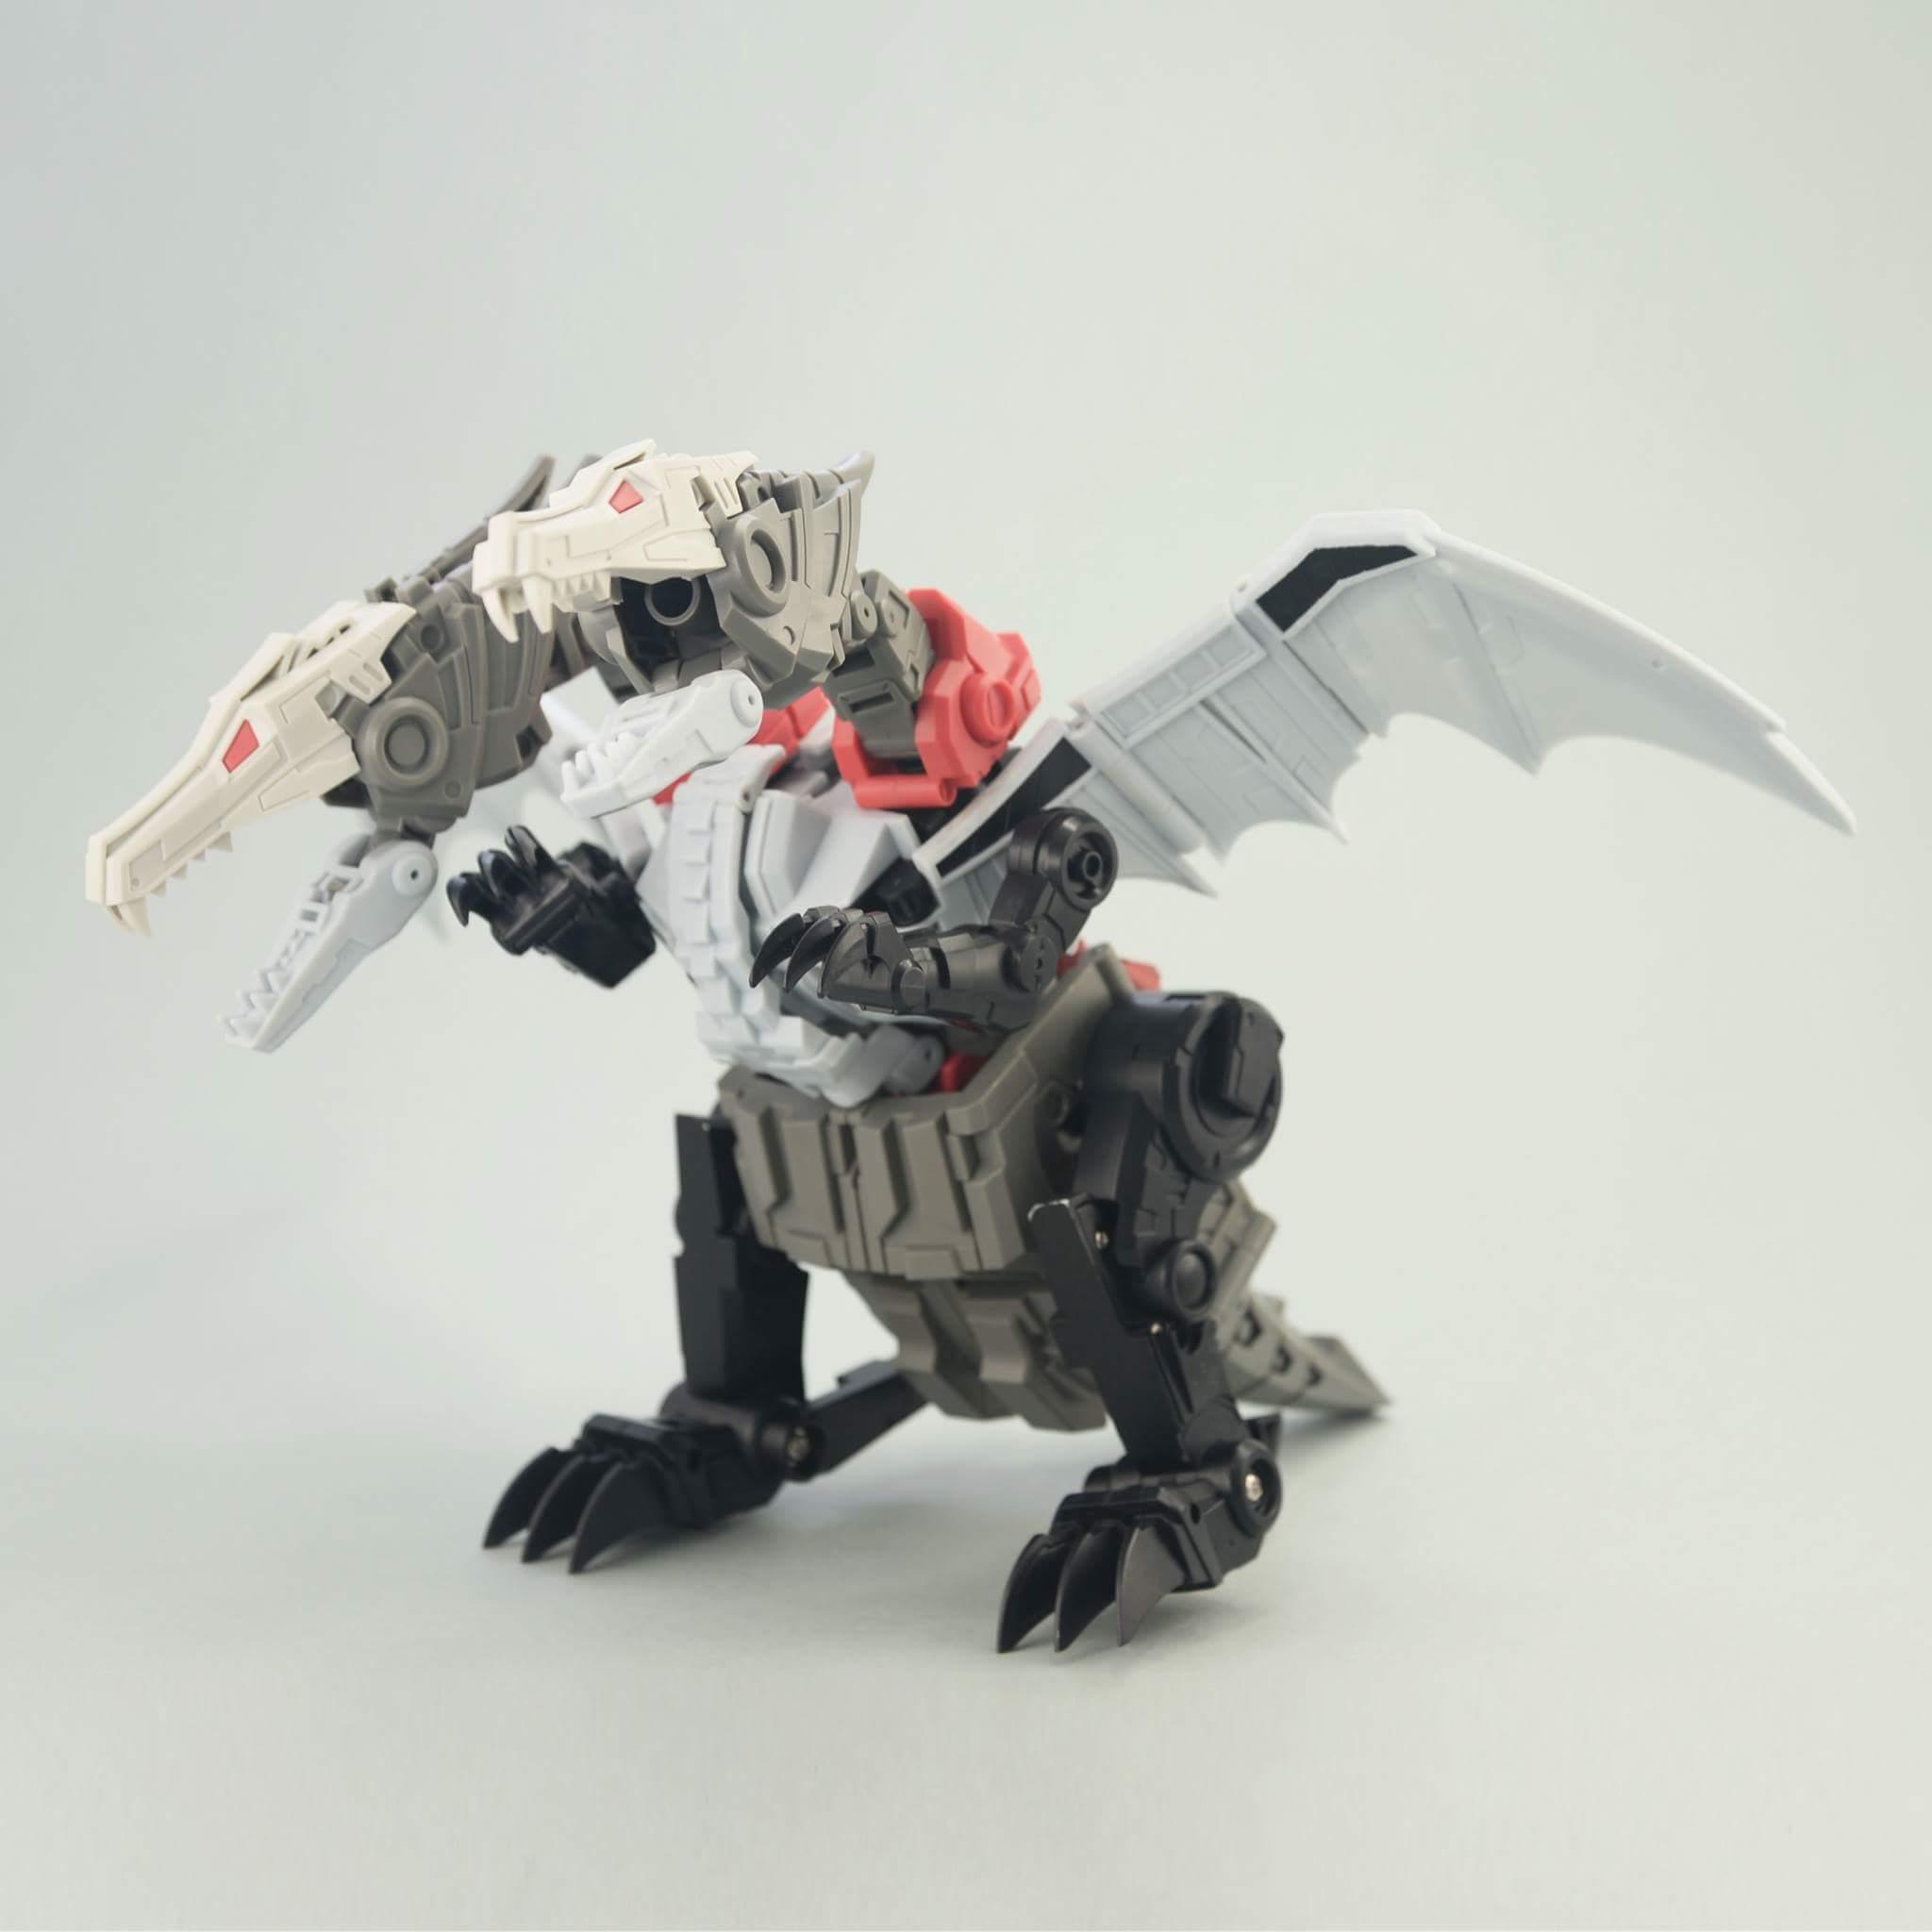 [FansHobby] Produit Tiers - Master Builder MB-02/03/05 - aka Monsterbots/Monstrebots - Page 2 HBCZsrsx